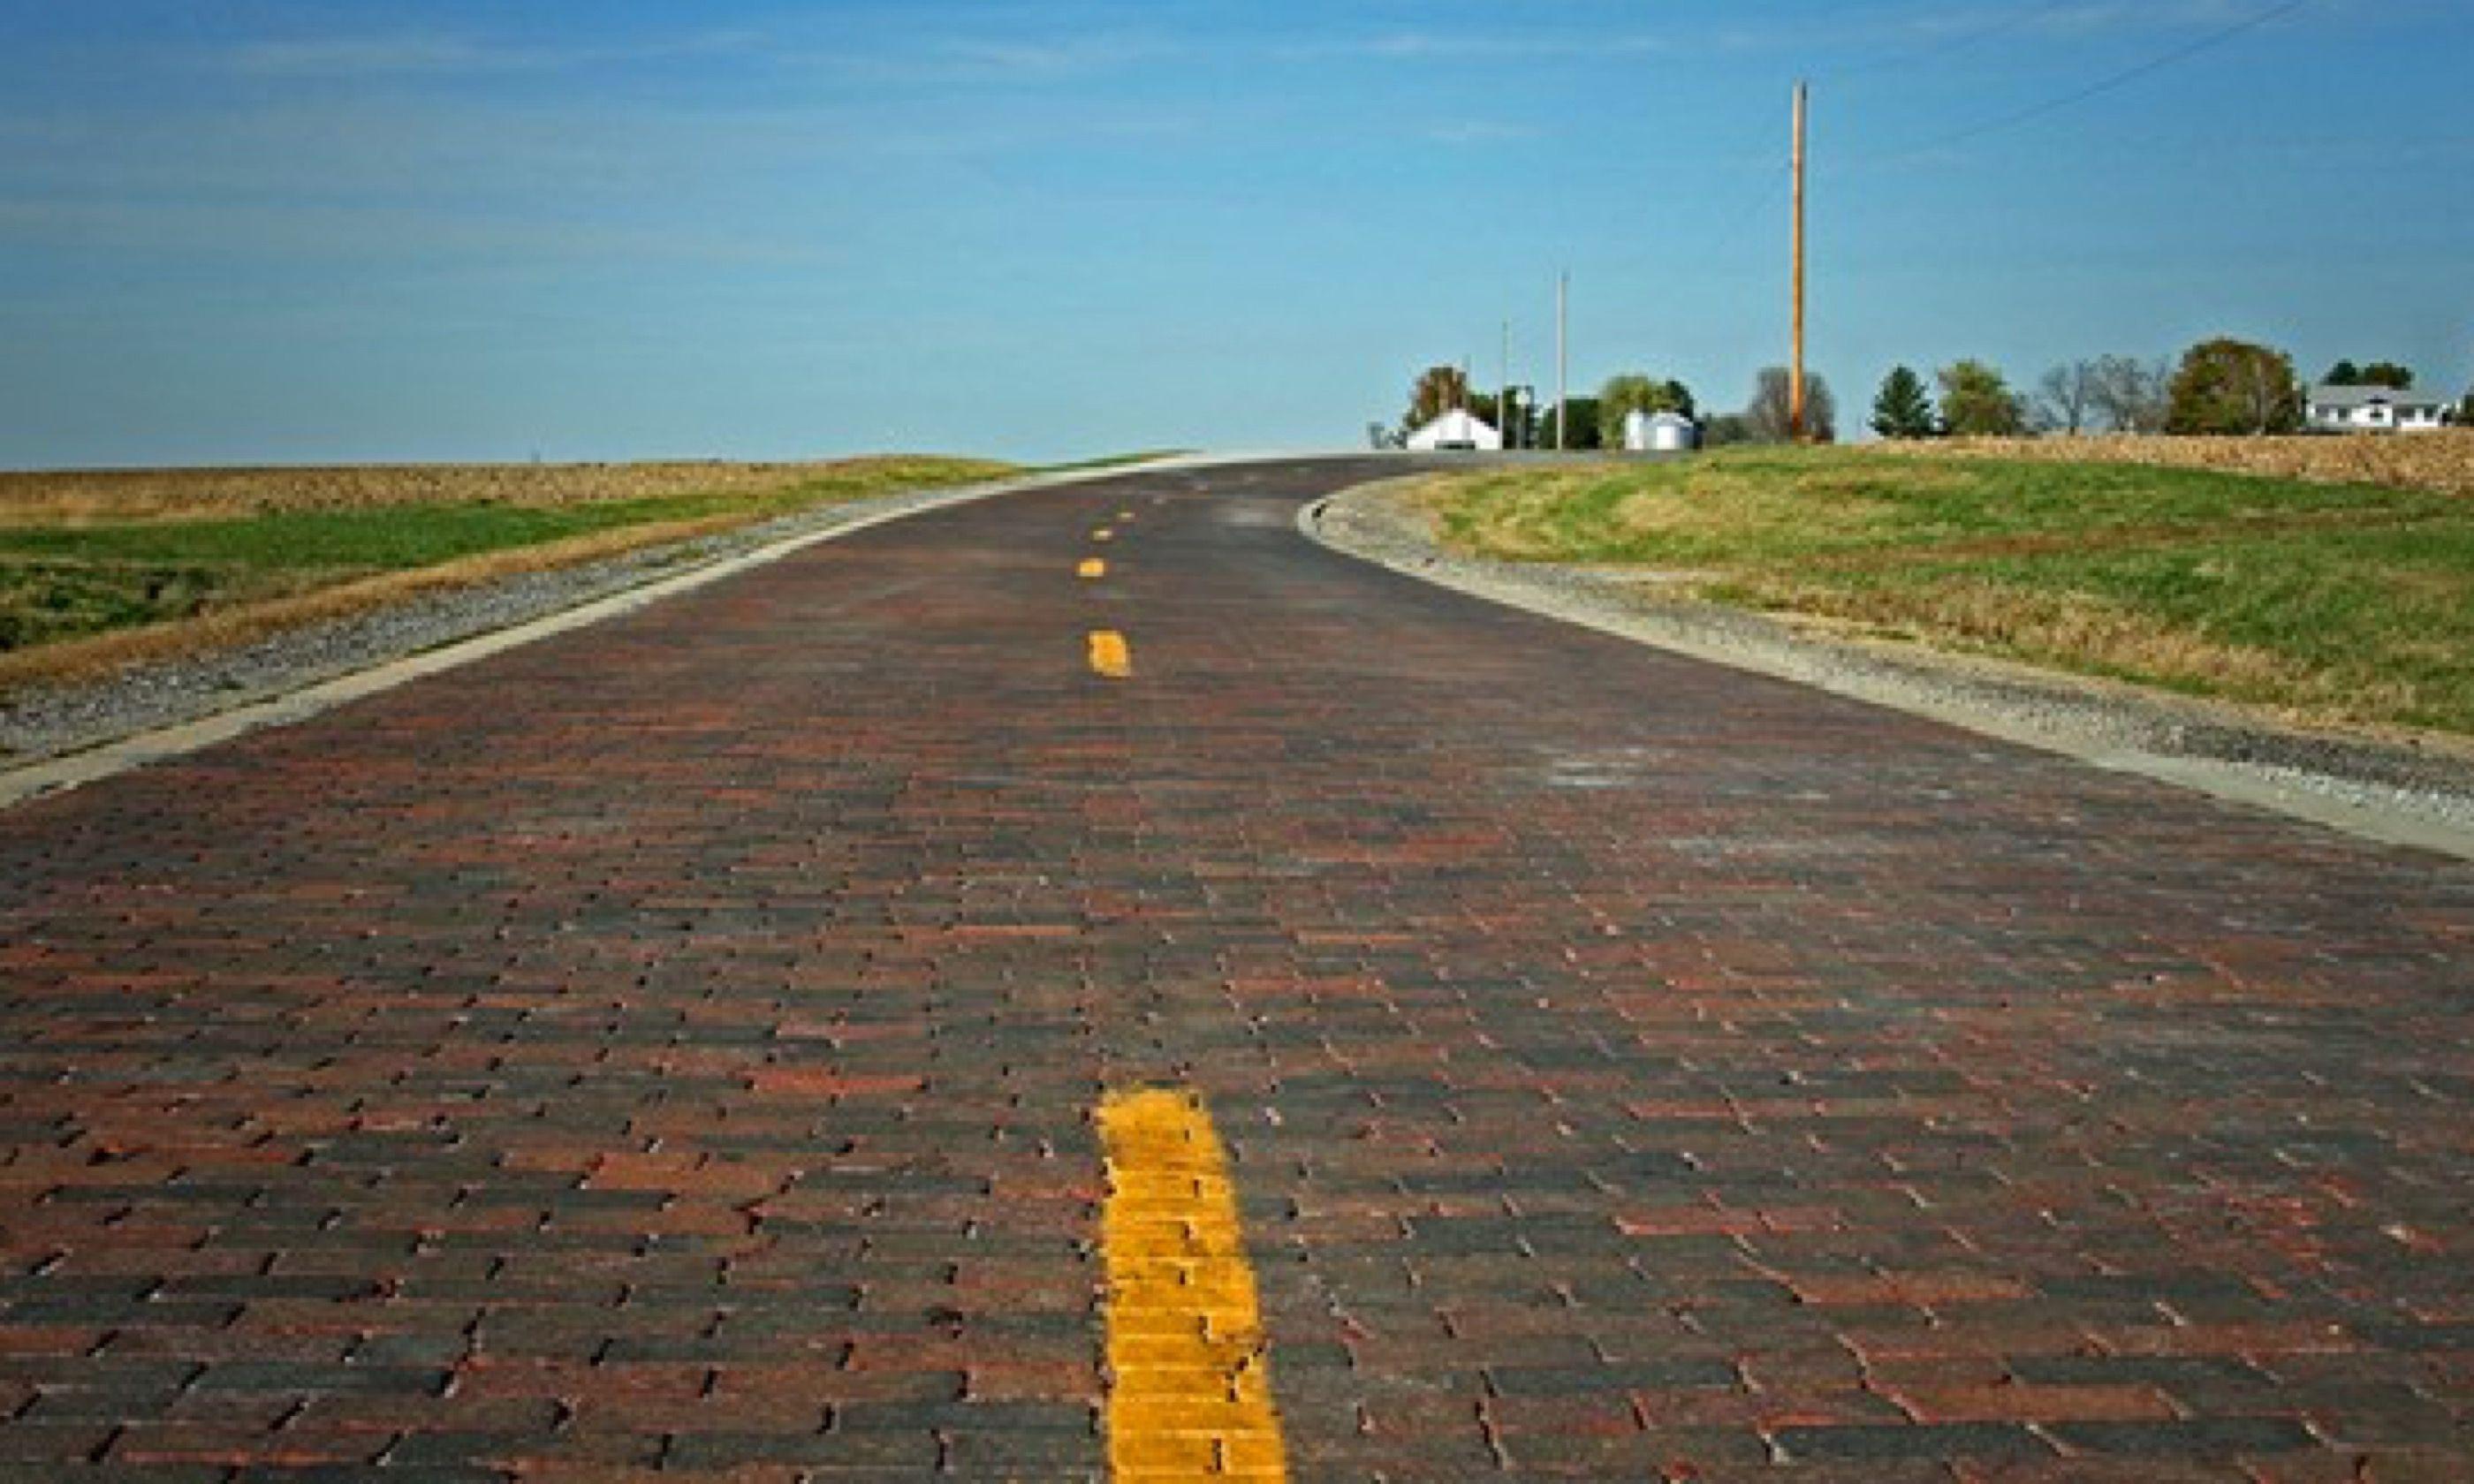 Original Route 66 Brick Road, Auburn (www.enjoyillinois.com)